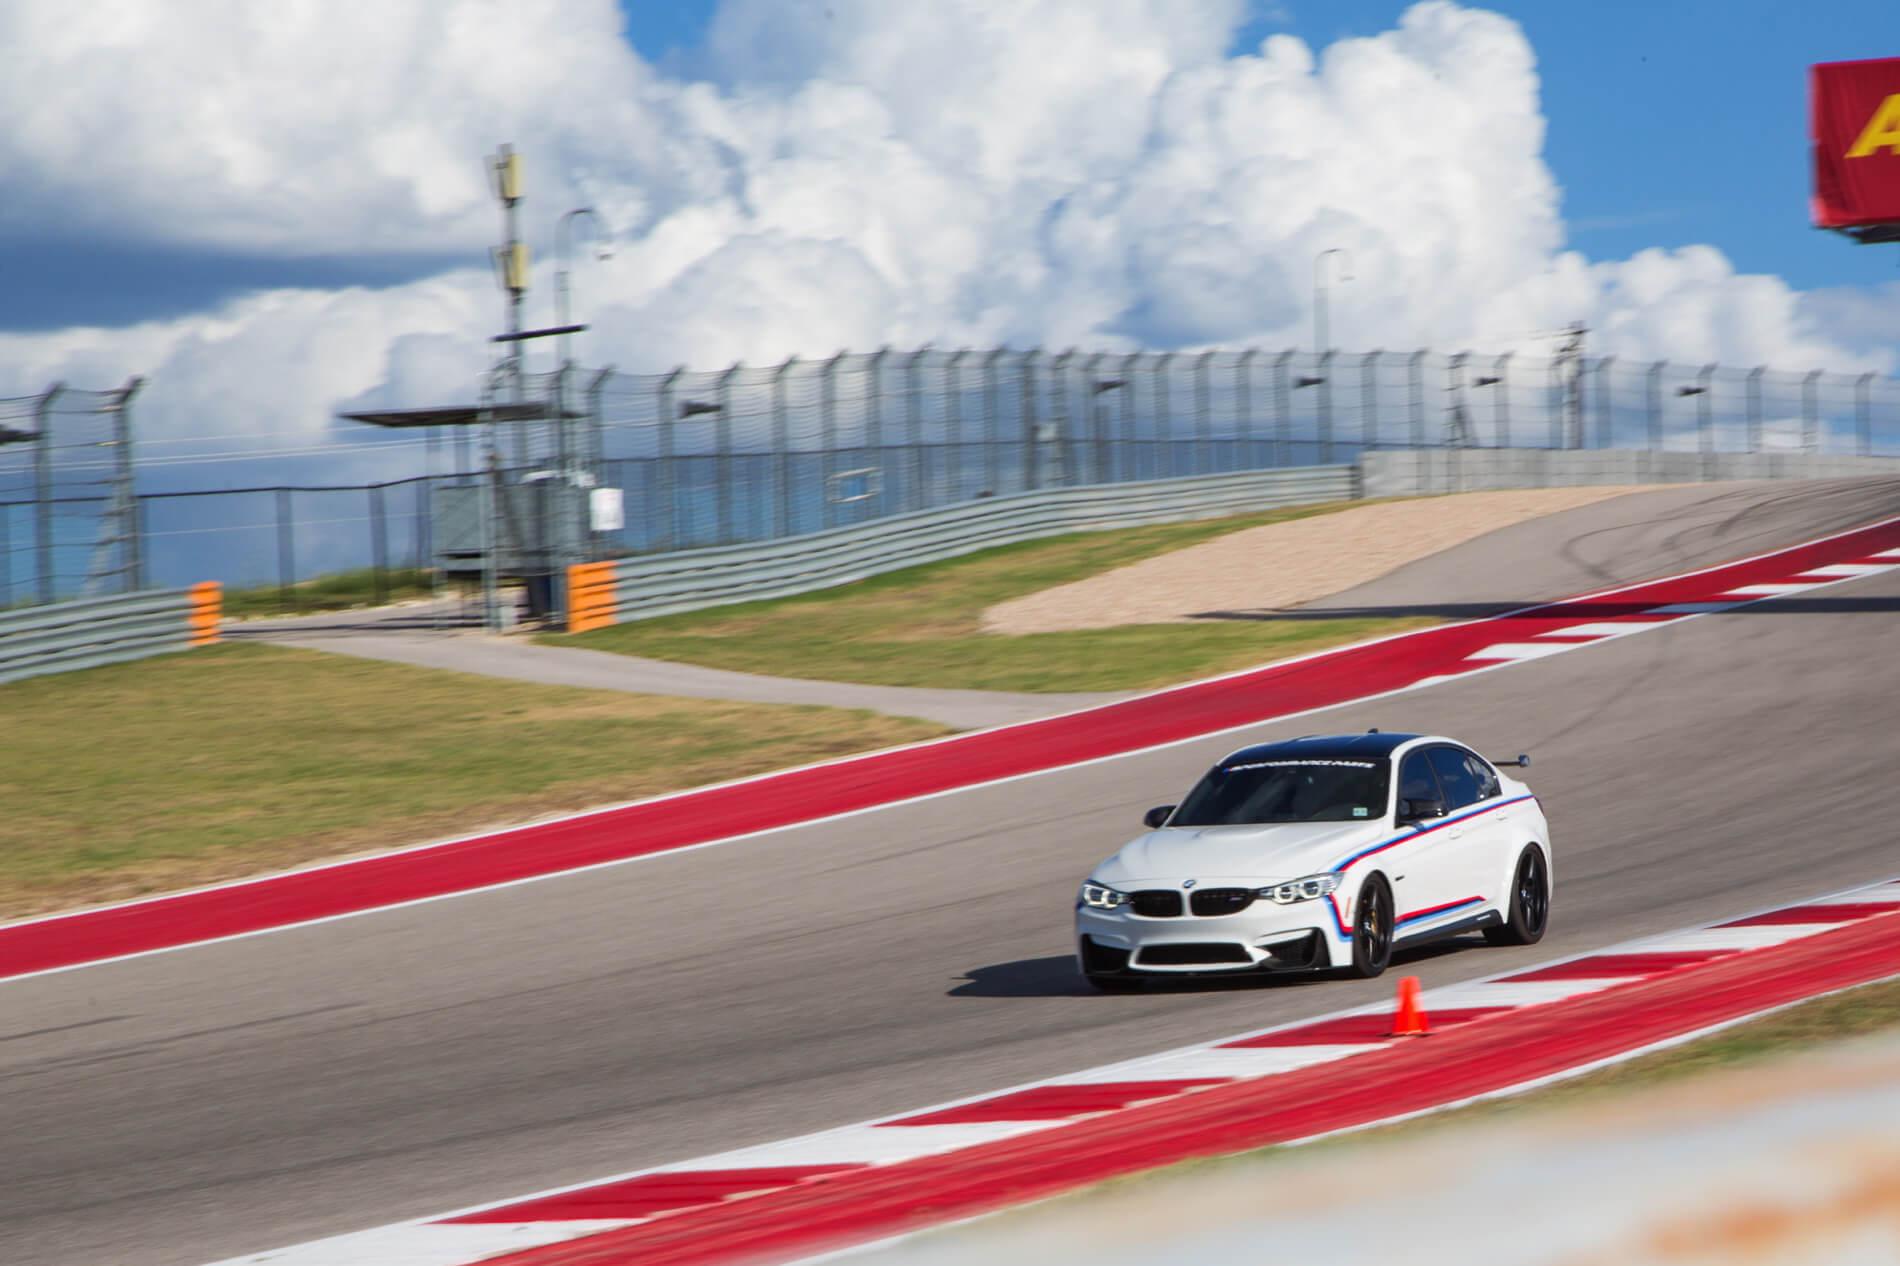 BMW-M-Track-Days-Austin-2017-56.jpg